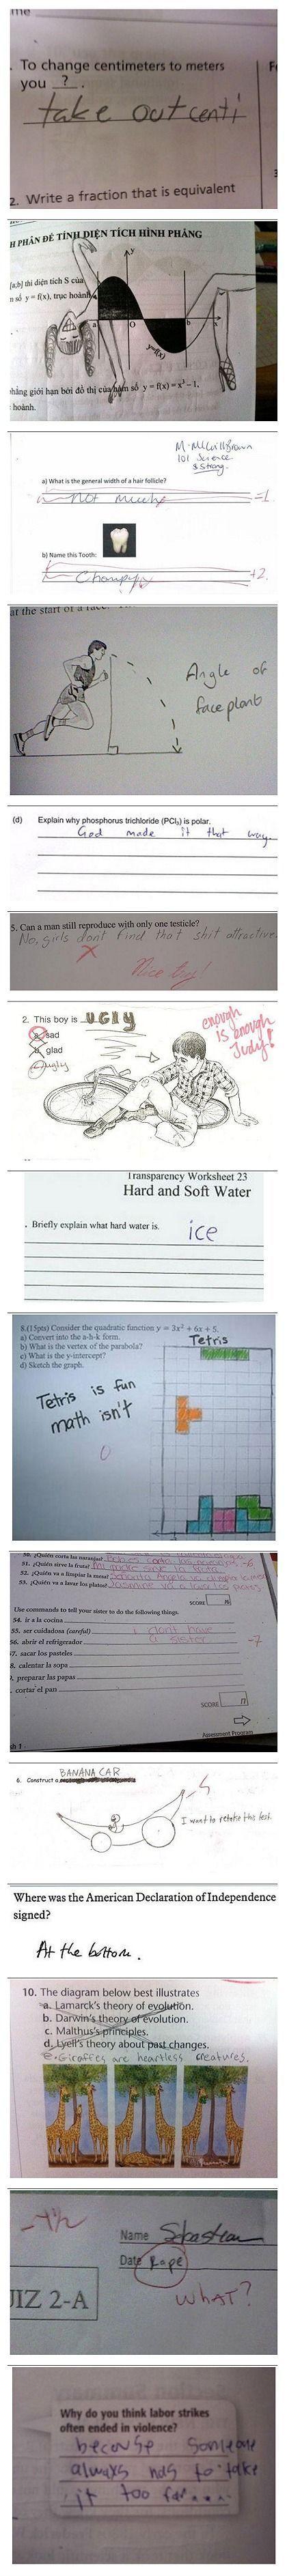 Nogle sjove eksamen svar!